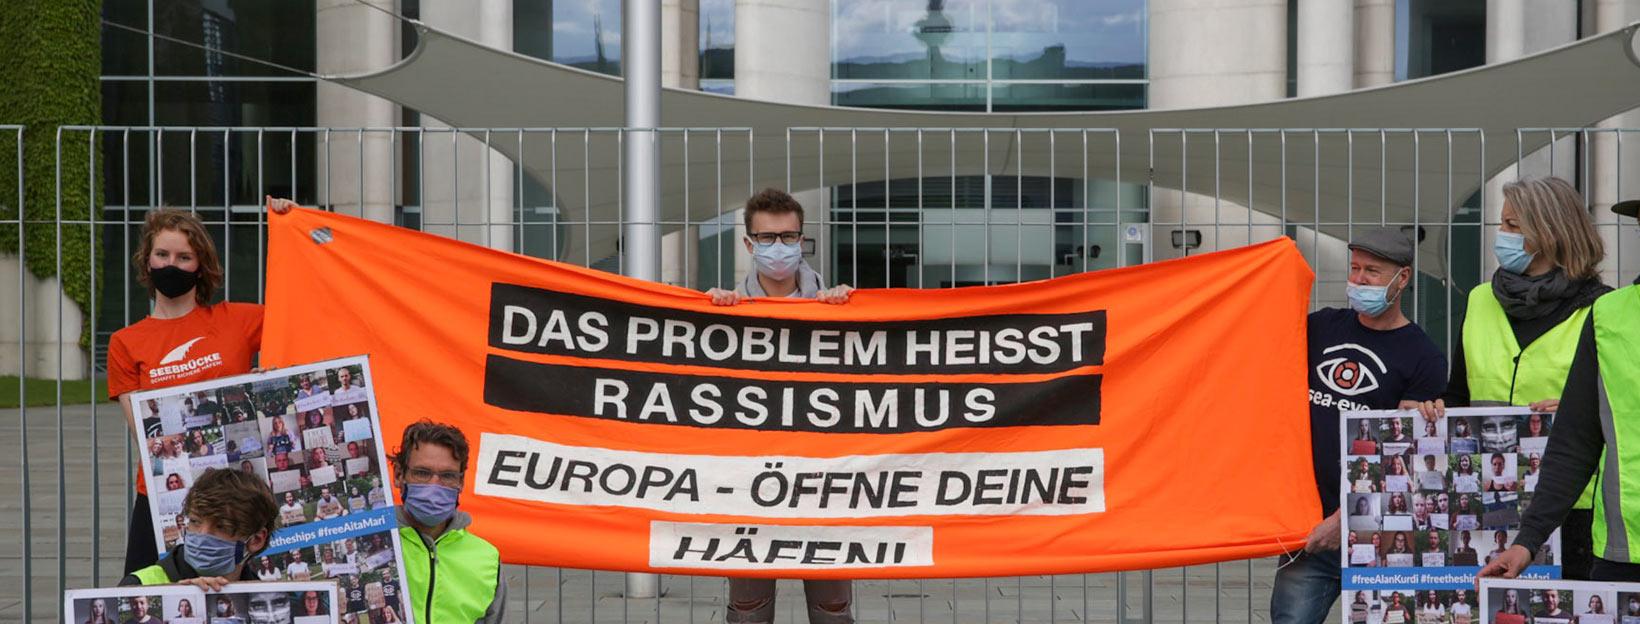 Demonstration in Berlin © Sophie Seydel